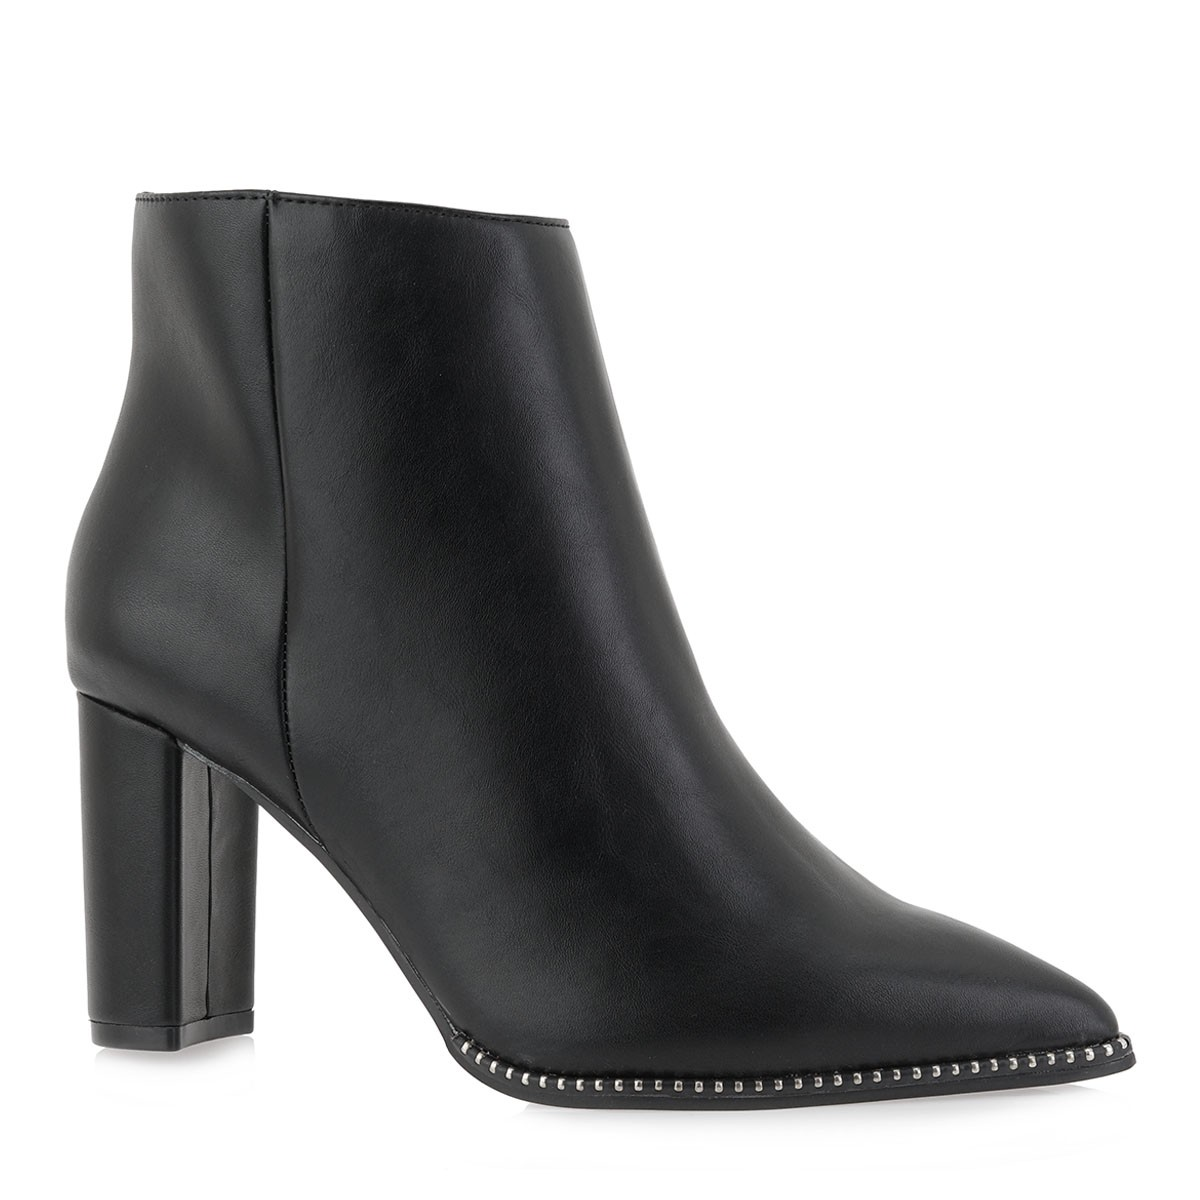 Exe Shoes Γυναικεία Μποτάκια PAMELA-440 Μαύρo J370004404001